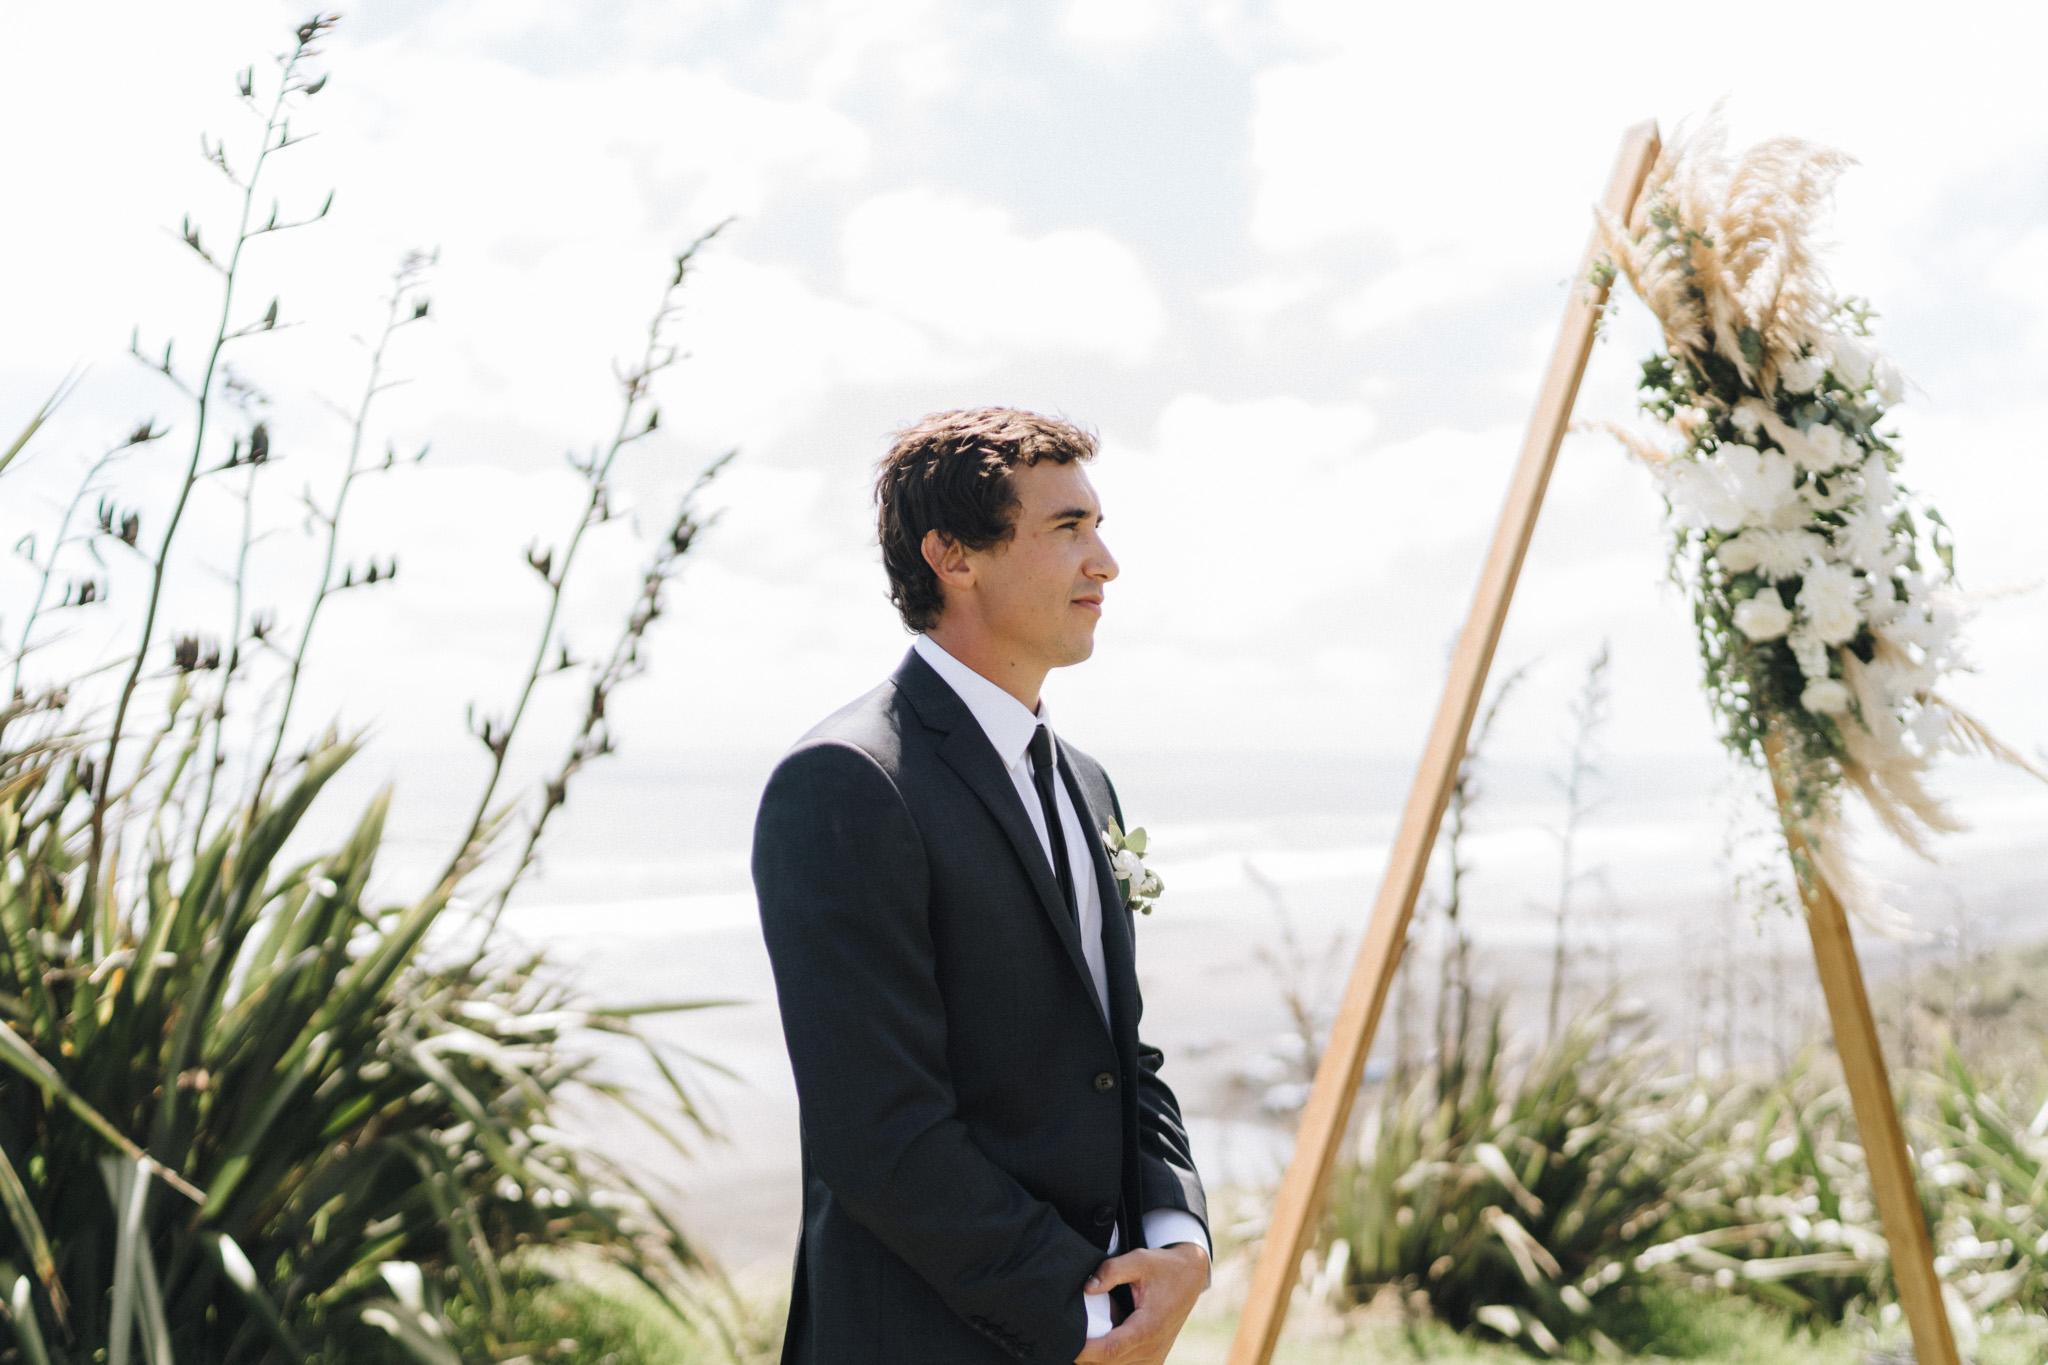 newfound-h-m-castaways-waiuku-auckland-wedding-photographer-109